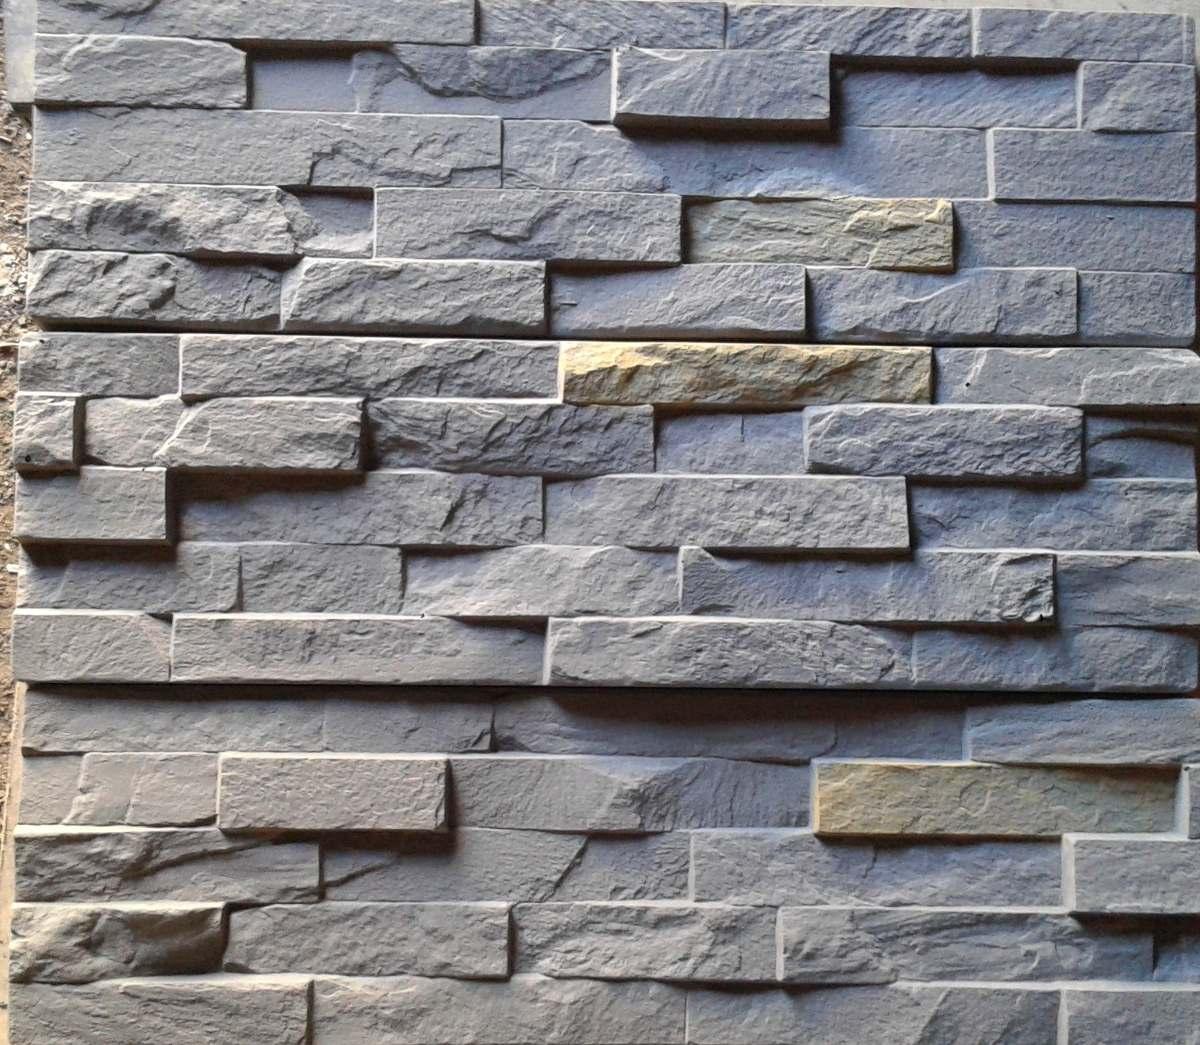 Baldosas de piedra baldosas de piedra natural polardur Baldosa pared piedra